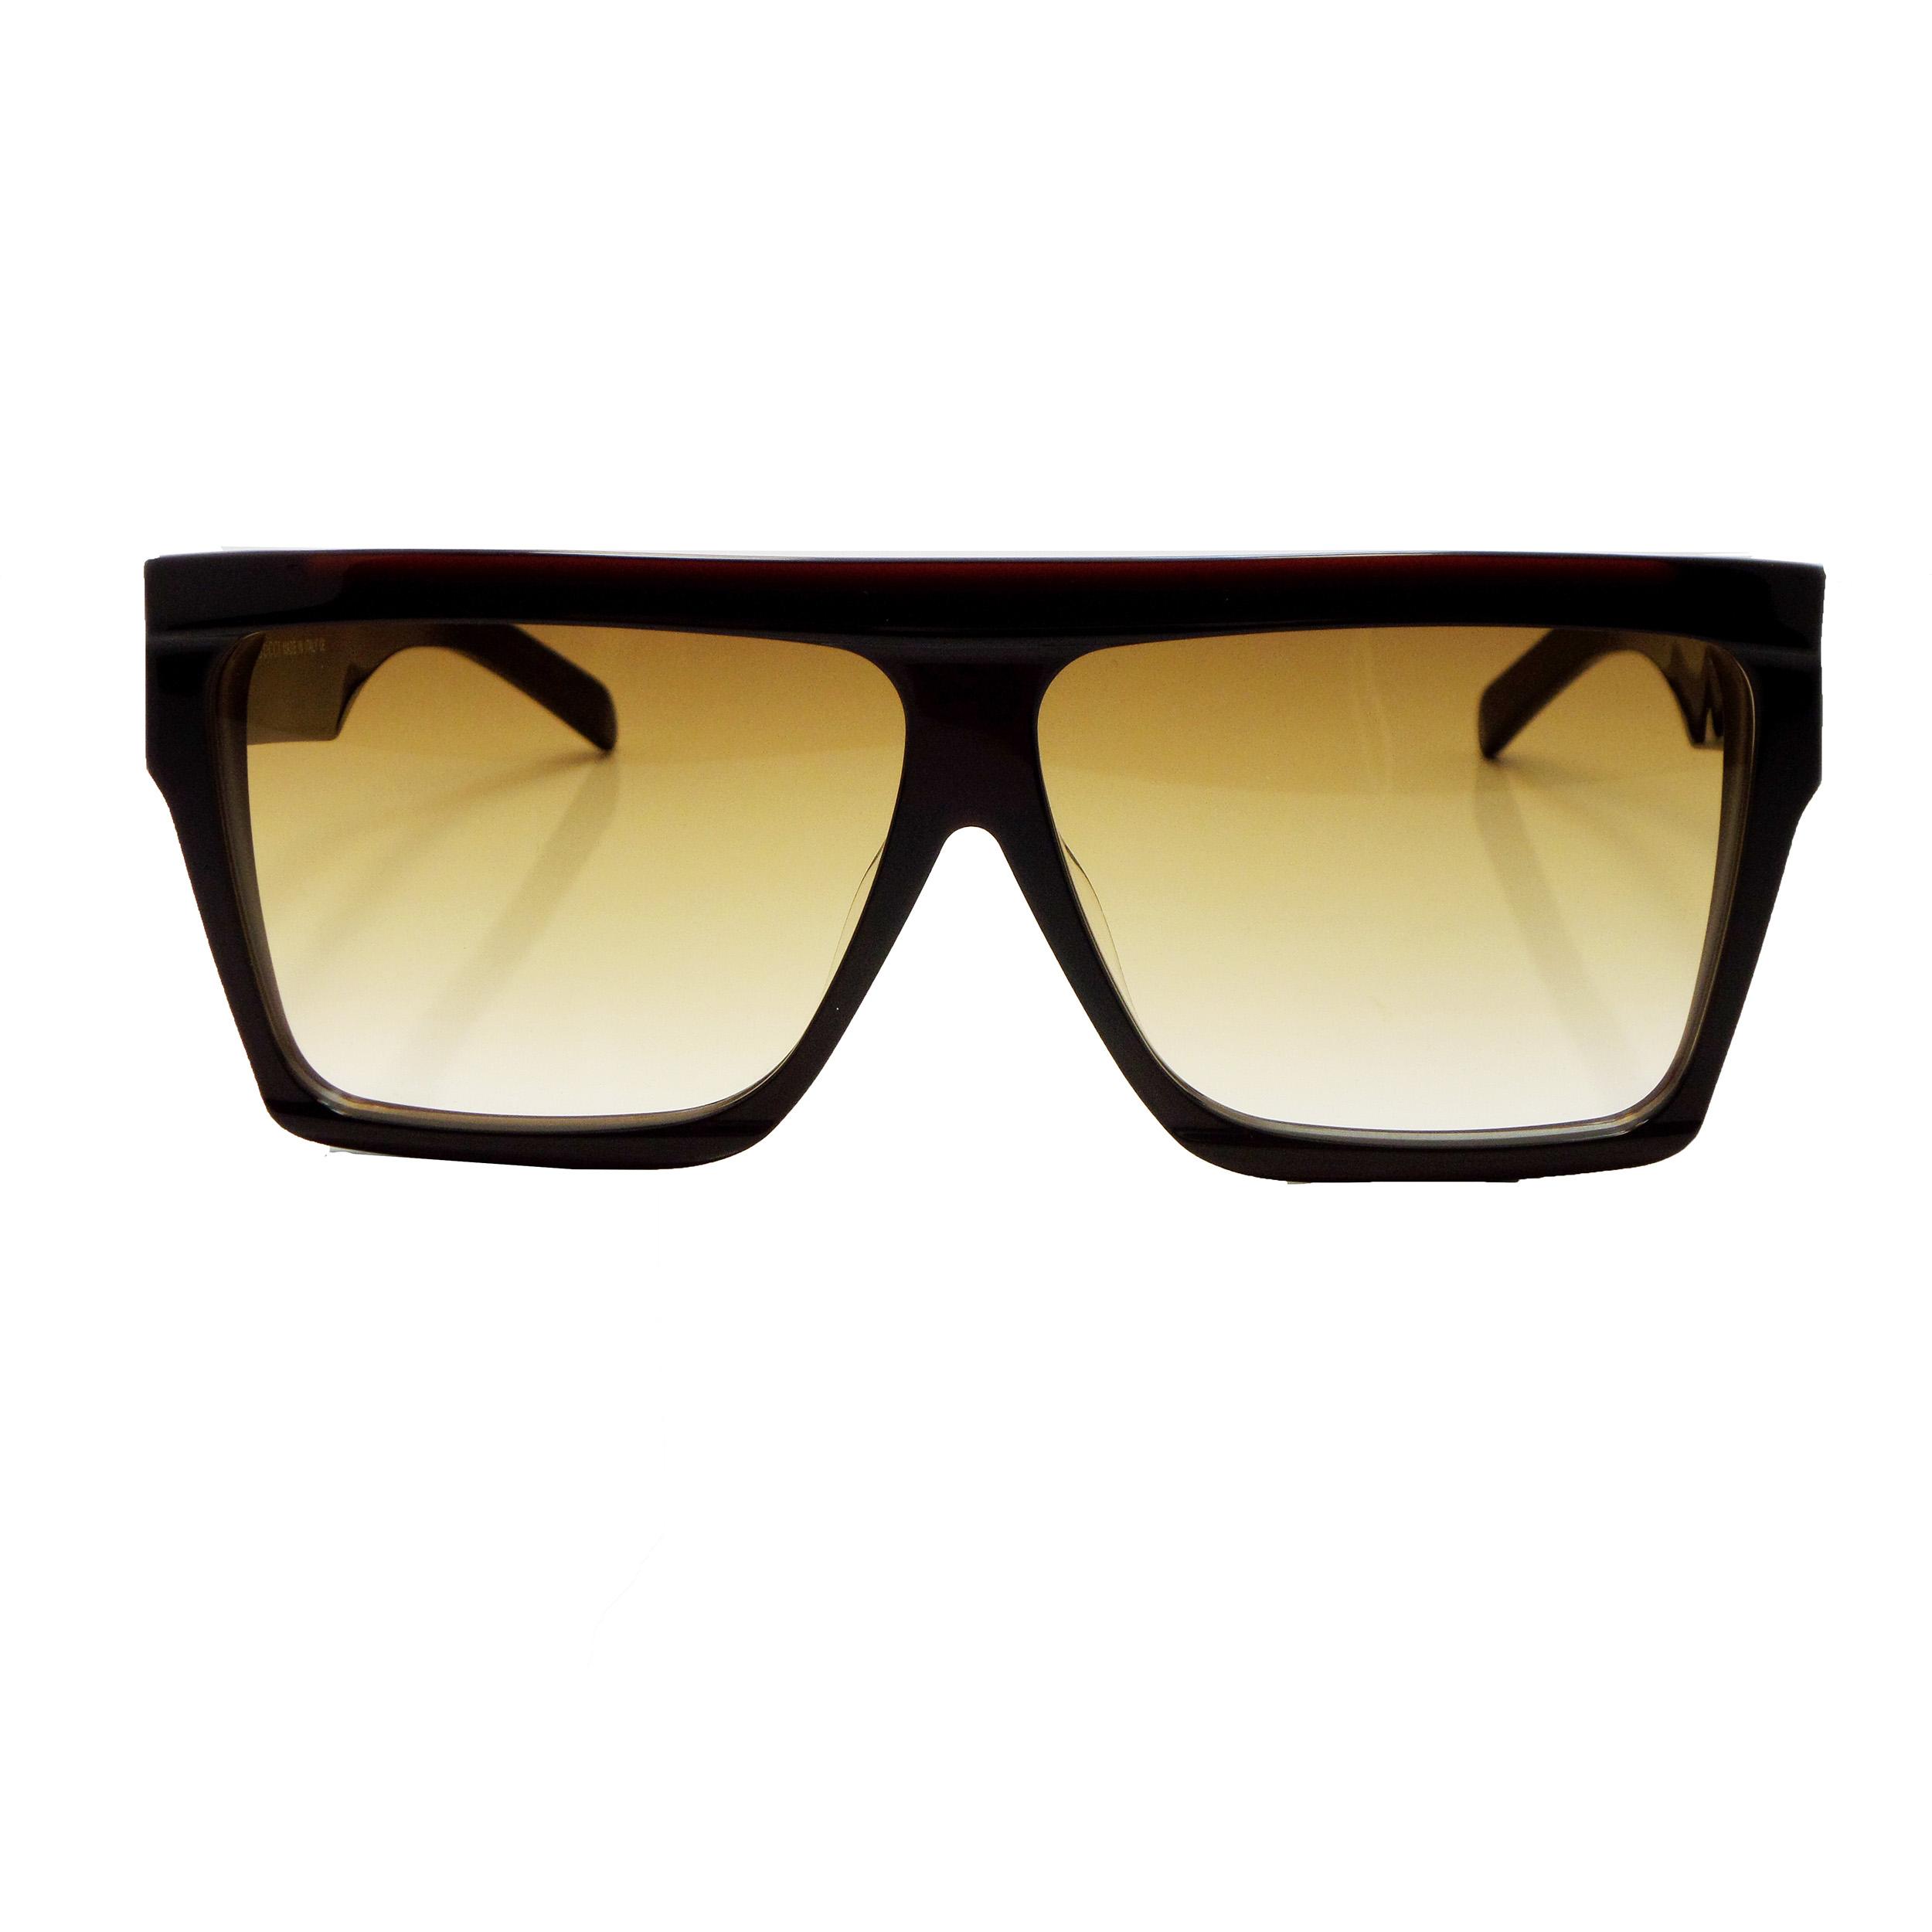 عینک آفتابی گوچی مدل GG1067